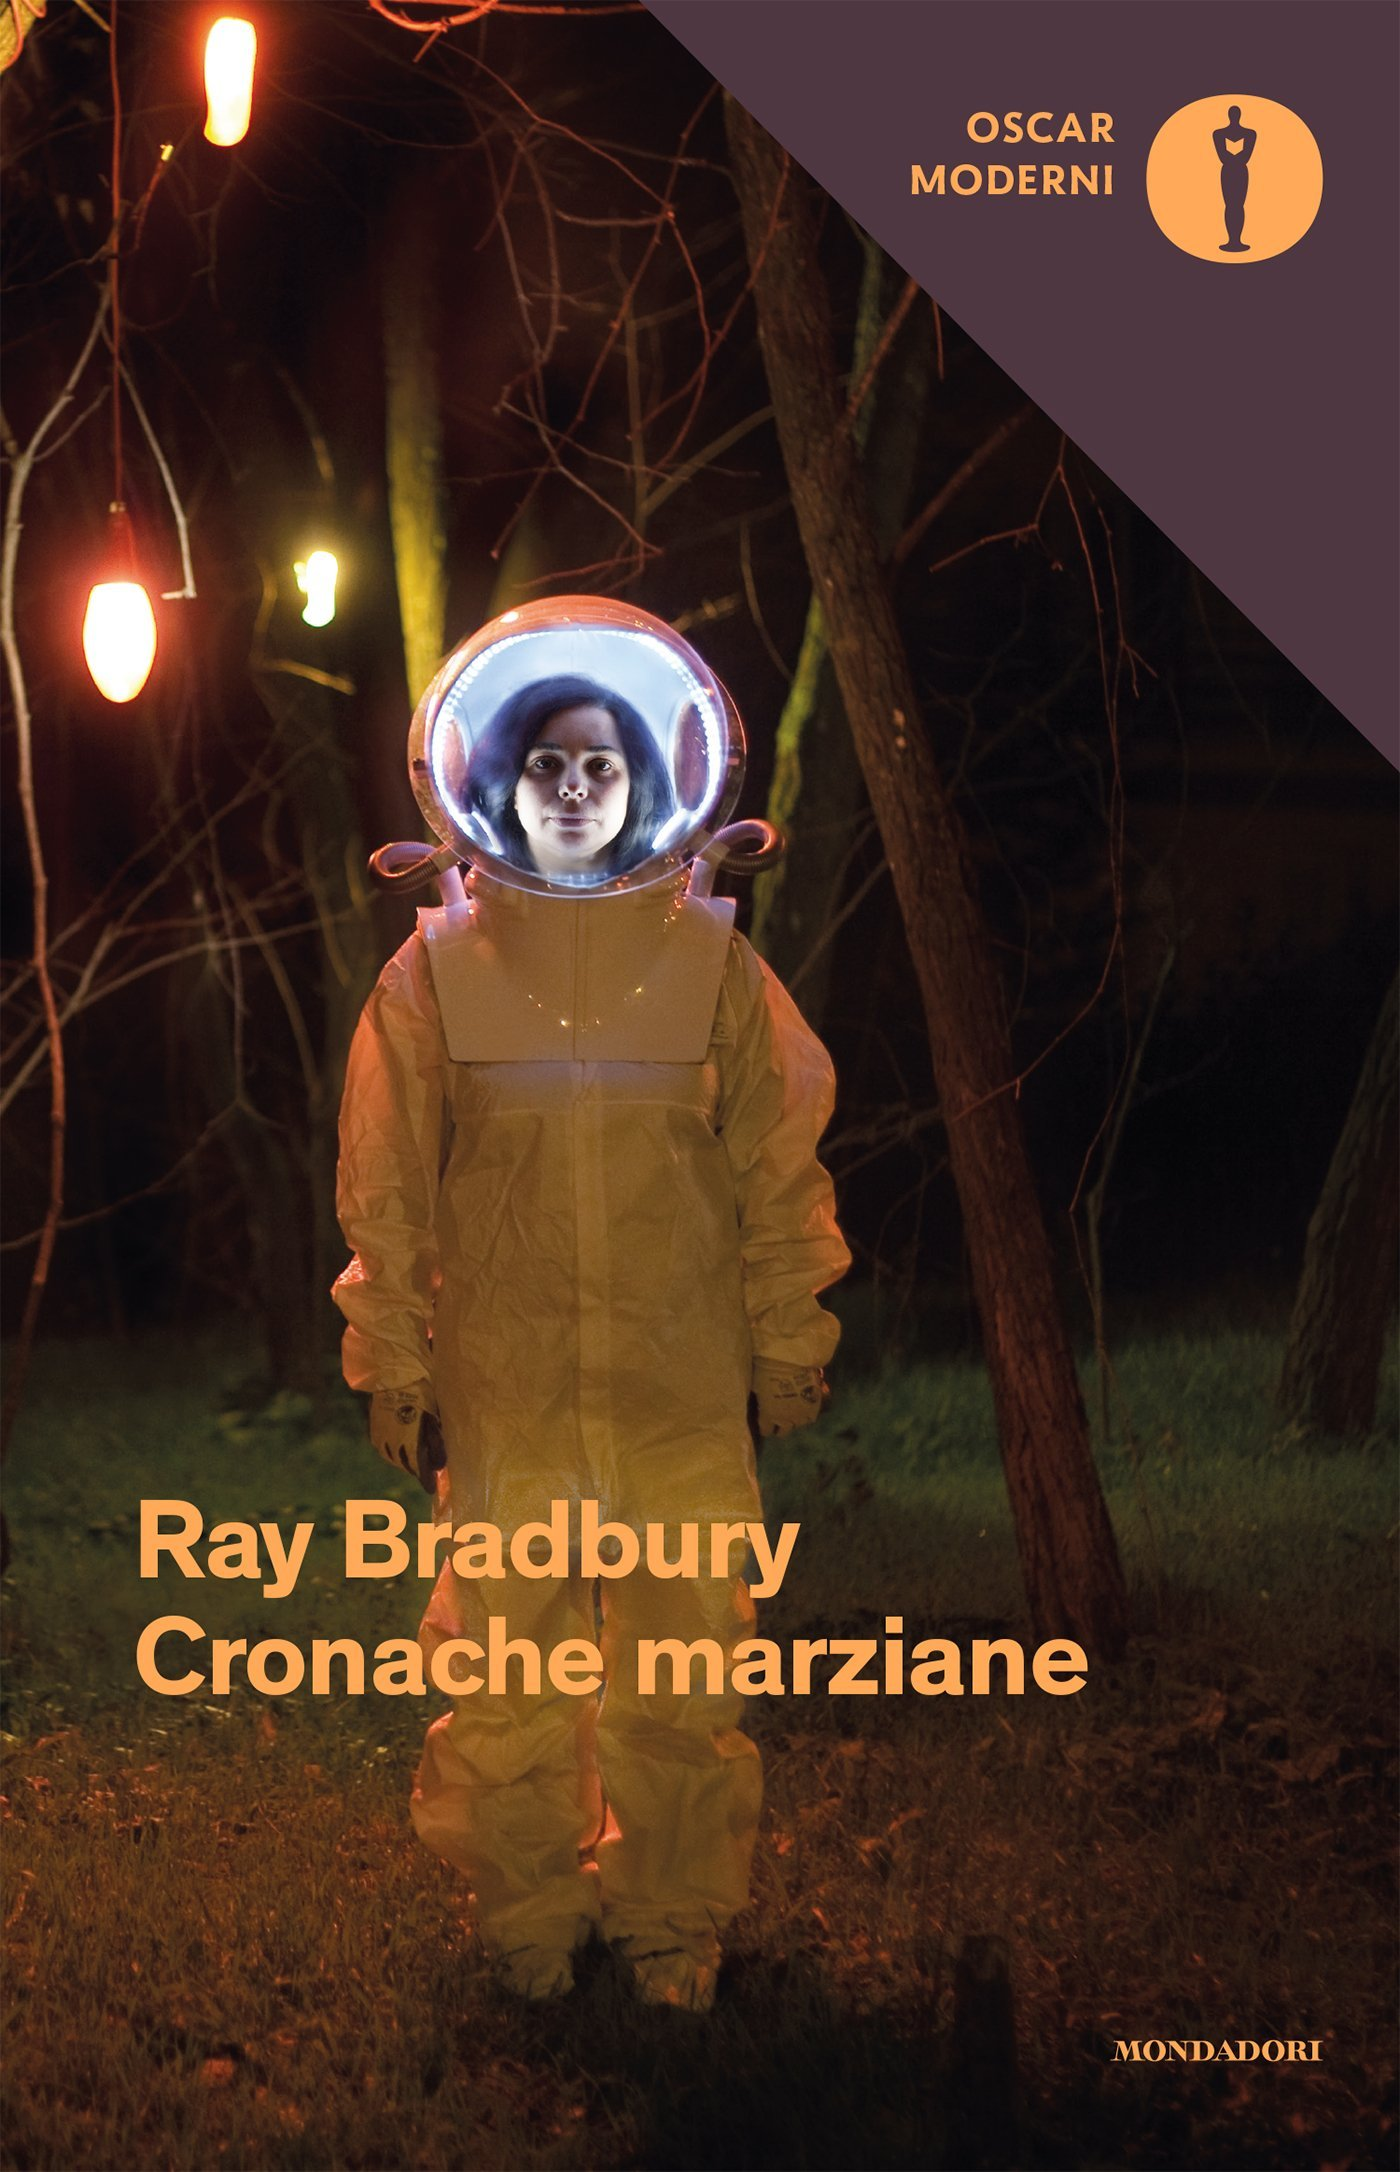 Cronache marziane Copertina flessibile – 24 mag 2016 Ray Bradbury G. Monicelli Mondadori 8804668164